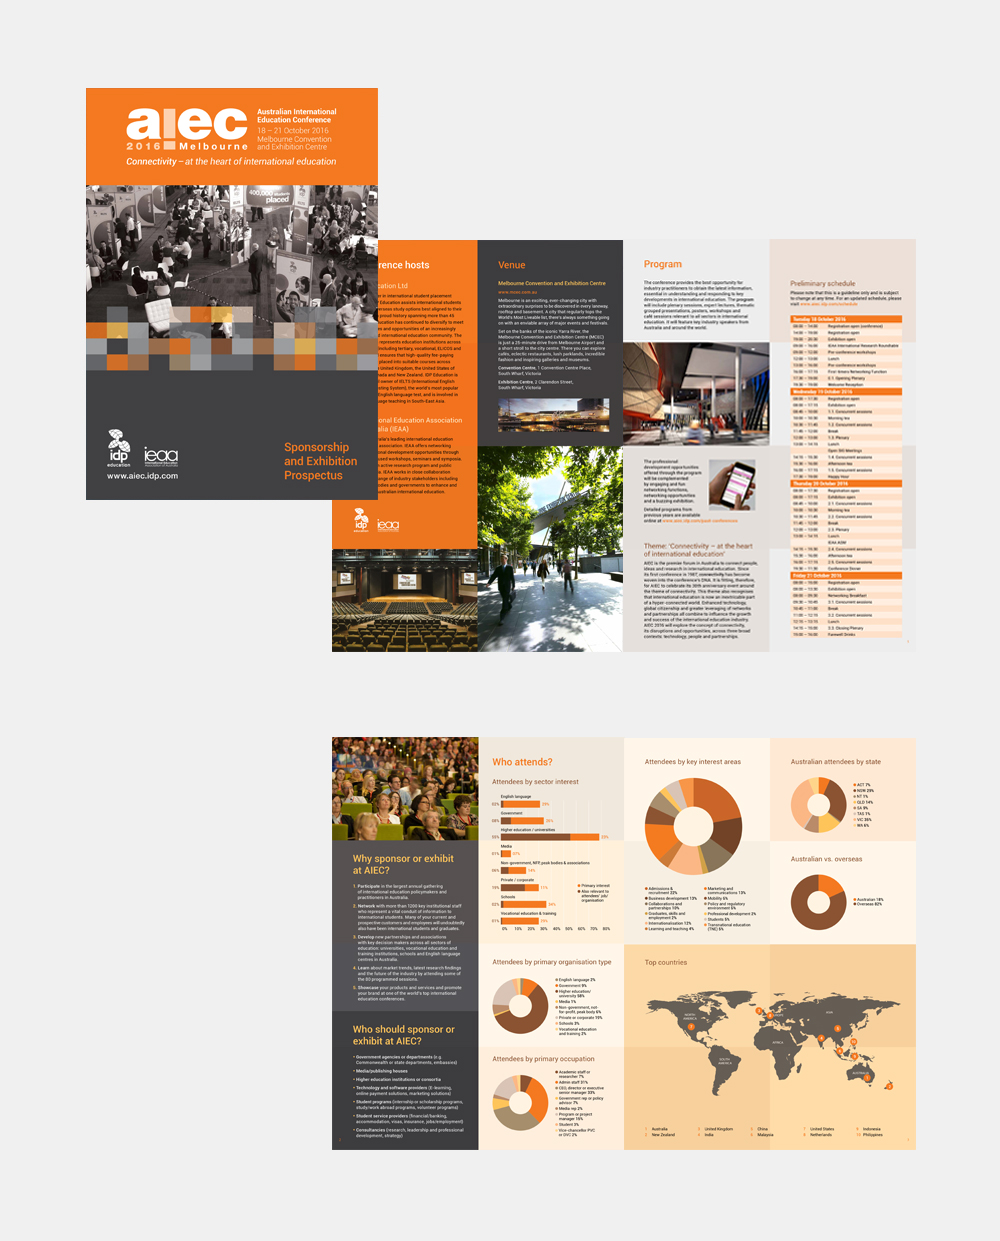 Gray+Design+aiec+conference-2016+design.jpg